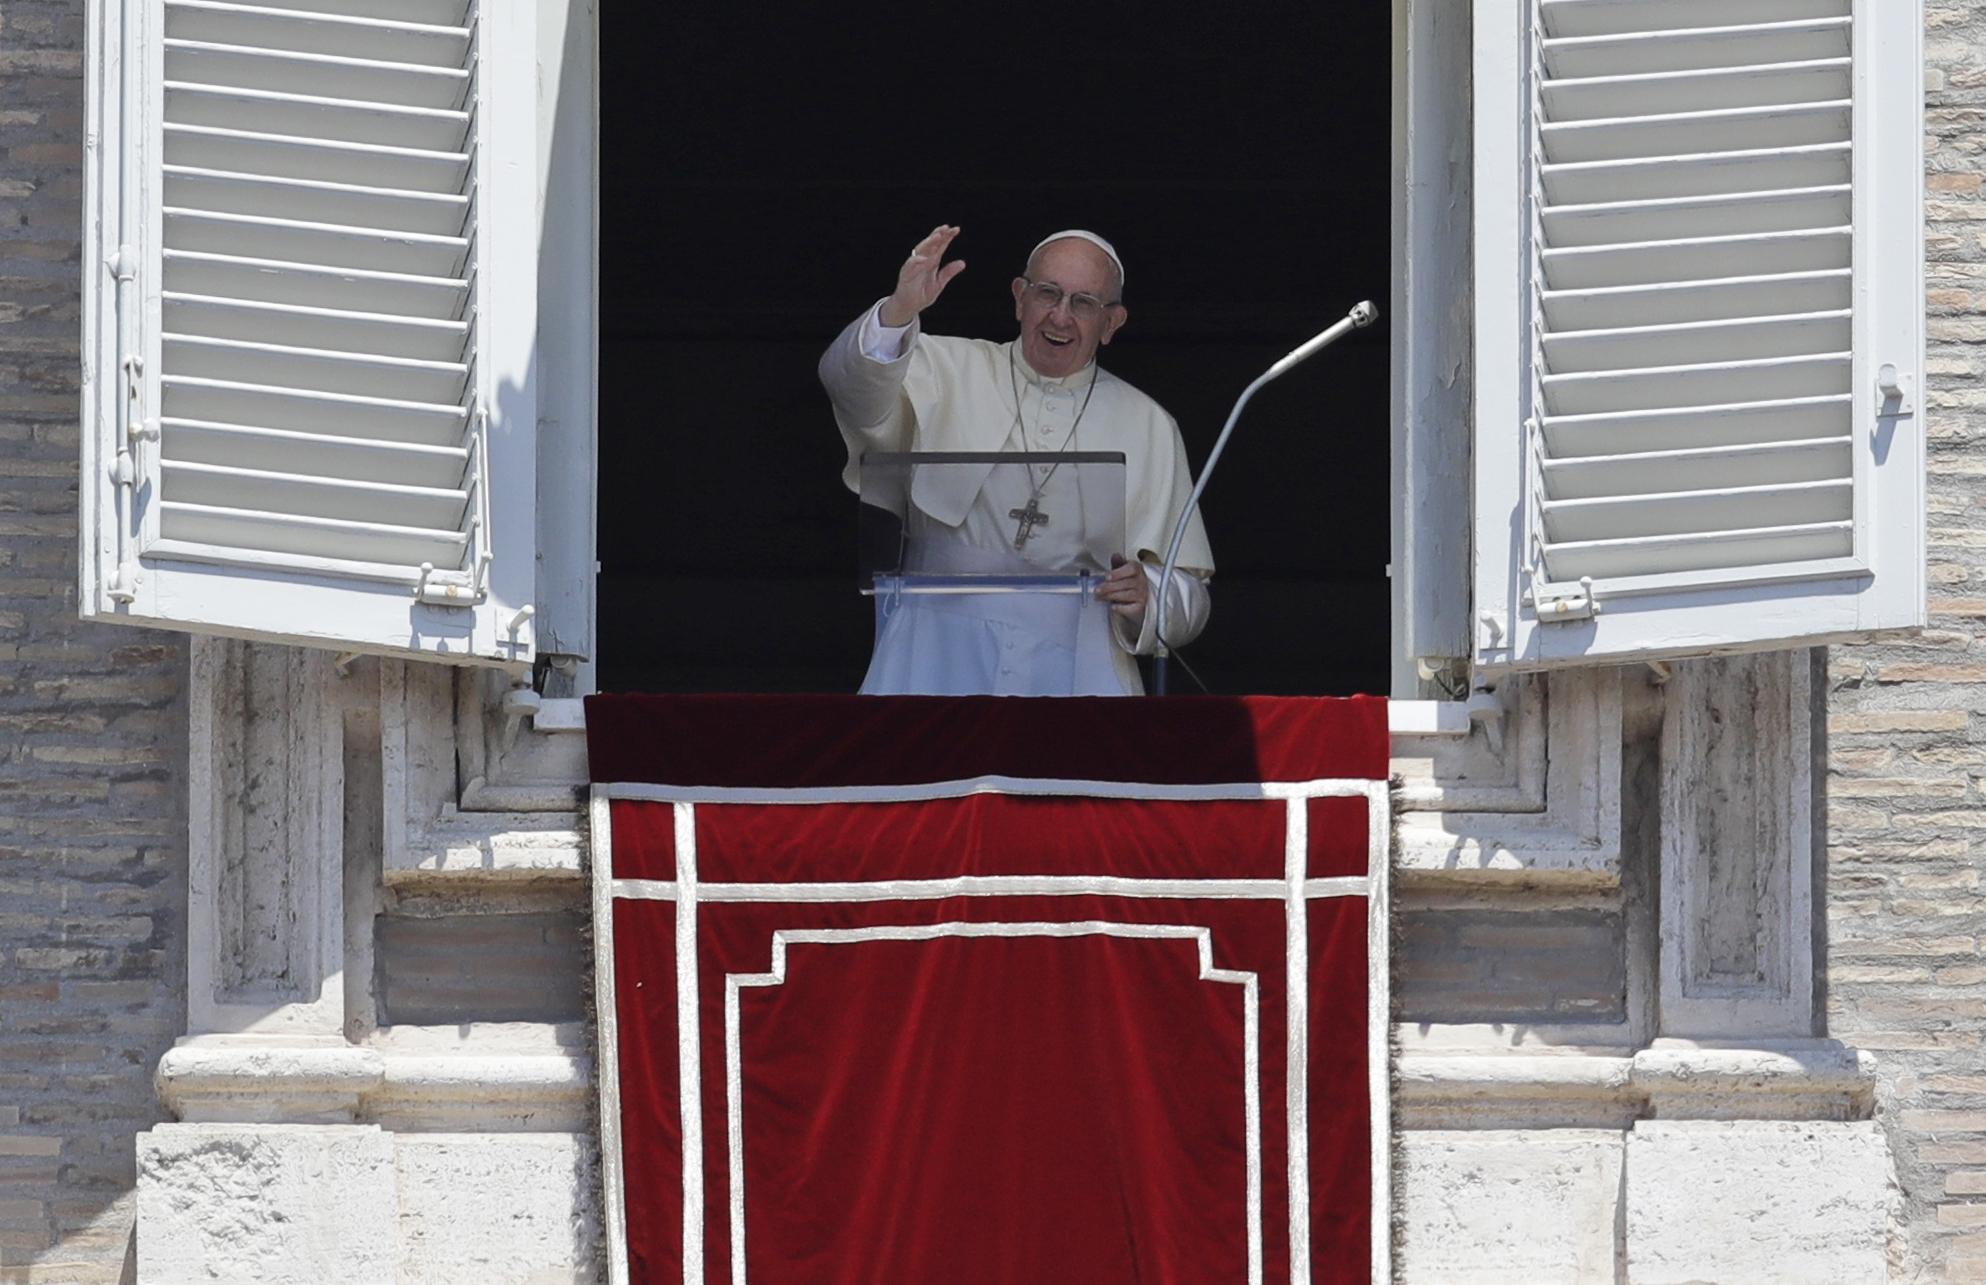 Vatican_Pope_82267-159532.jpg55659793